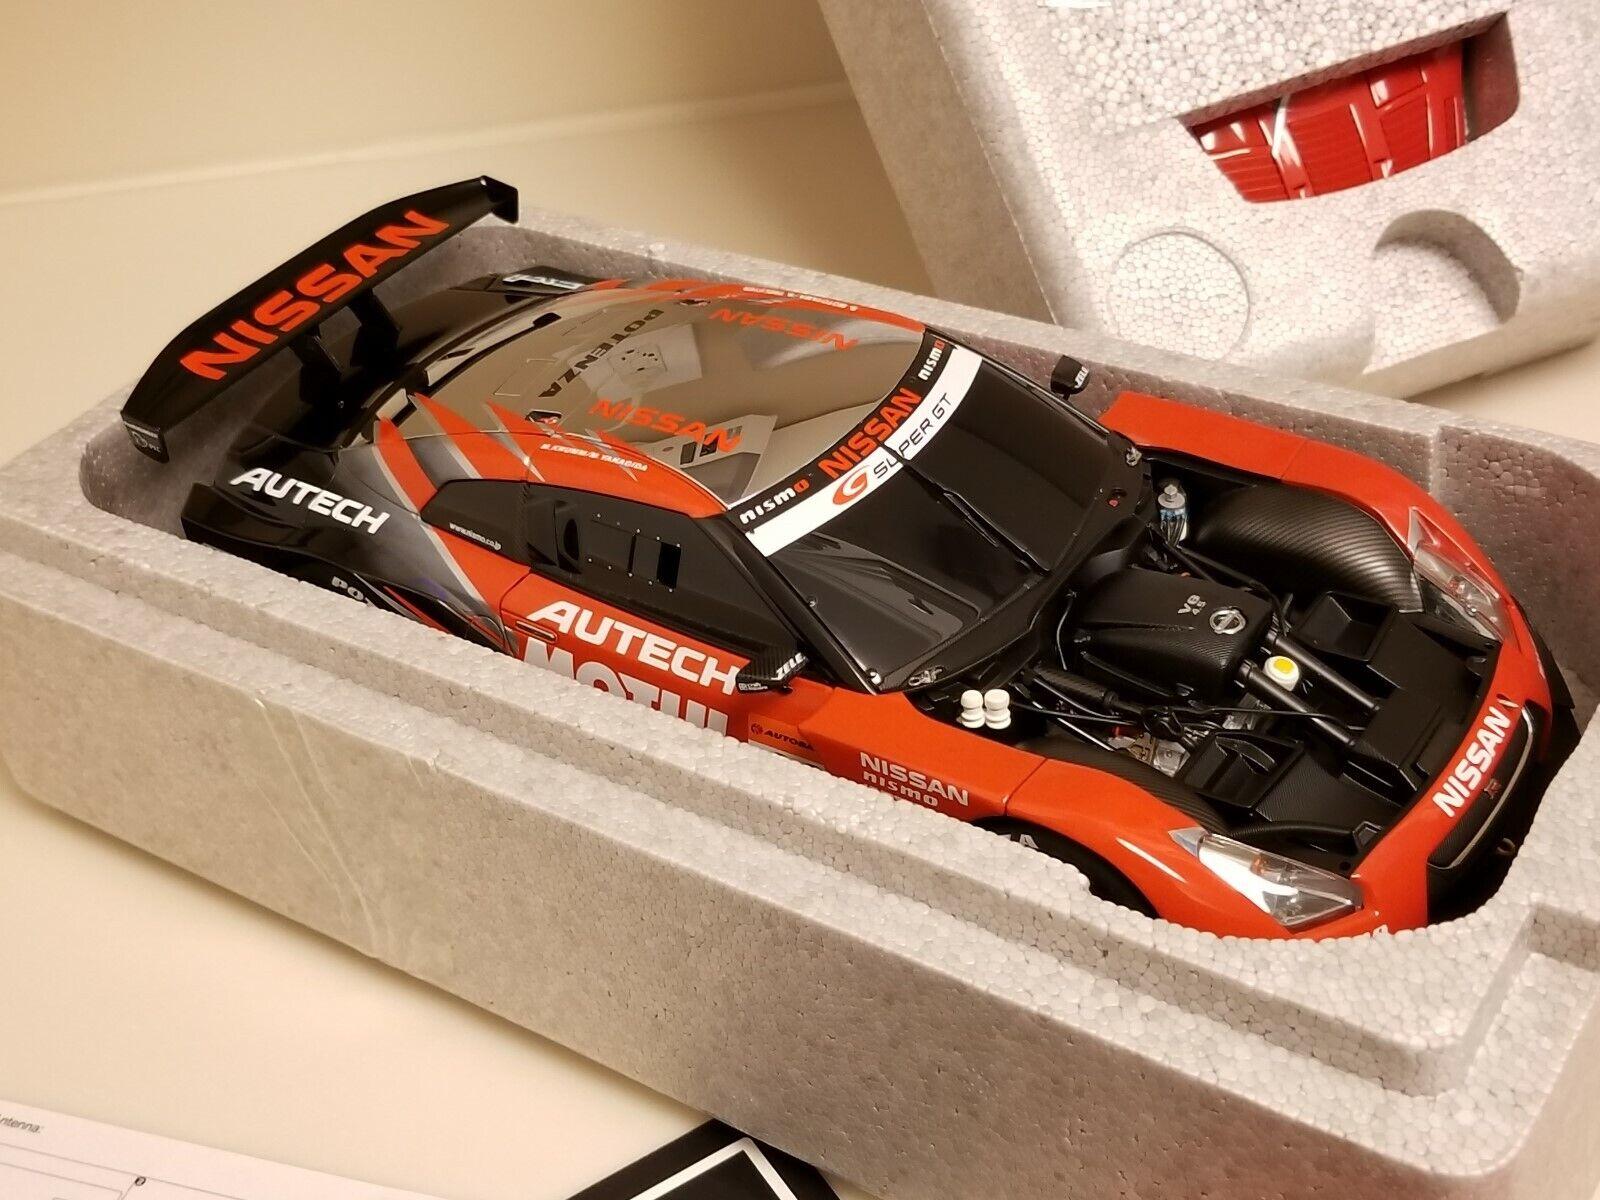 bilkonst 1  18 Nissan GT -R tävlings Super GT 2008 LAUNCH Version 80879 NEW